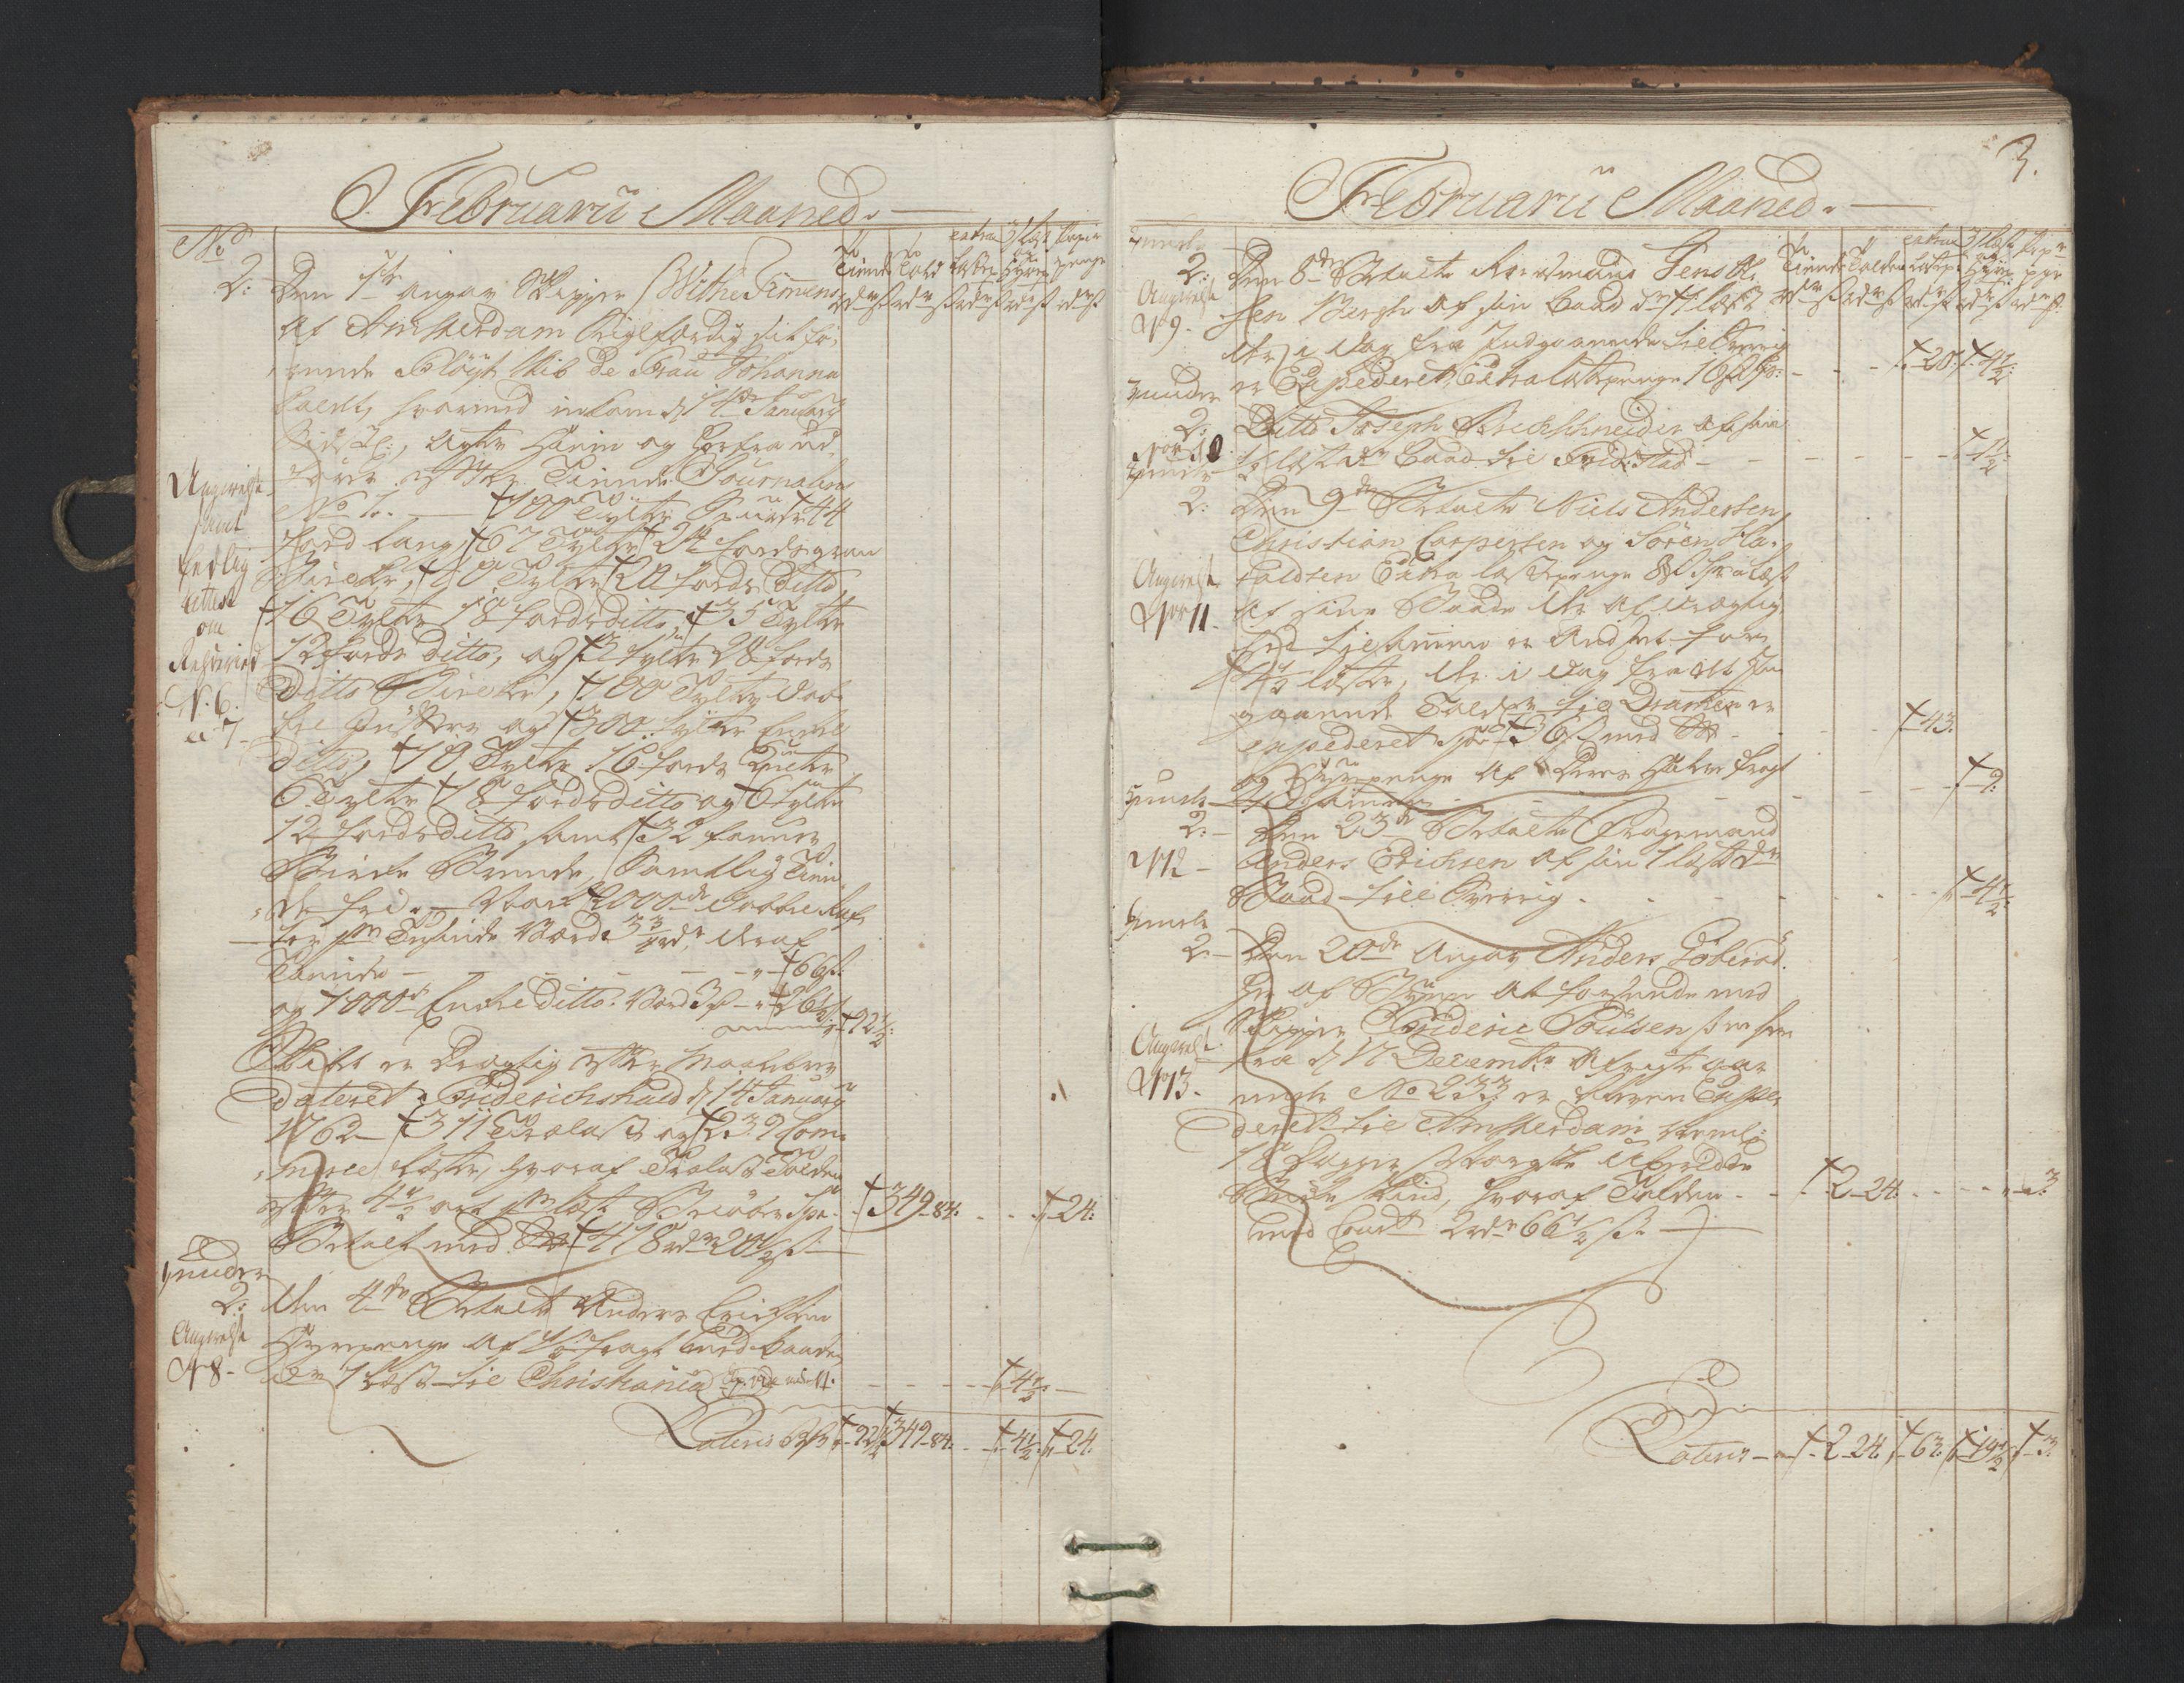 RA, Generaltollkammeret, tollregnskaper, R01/L0047: Tollregnskaper Fredrikshald, 1762, s. 2b-3a